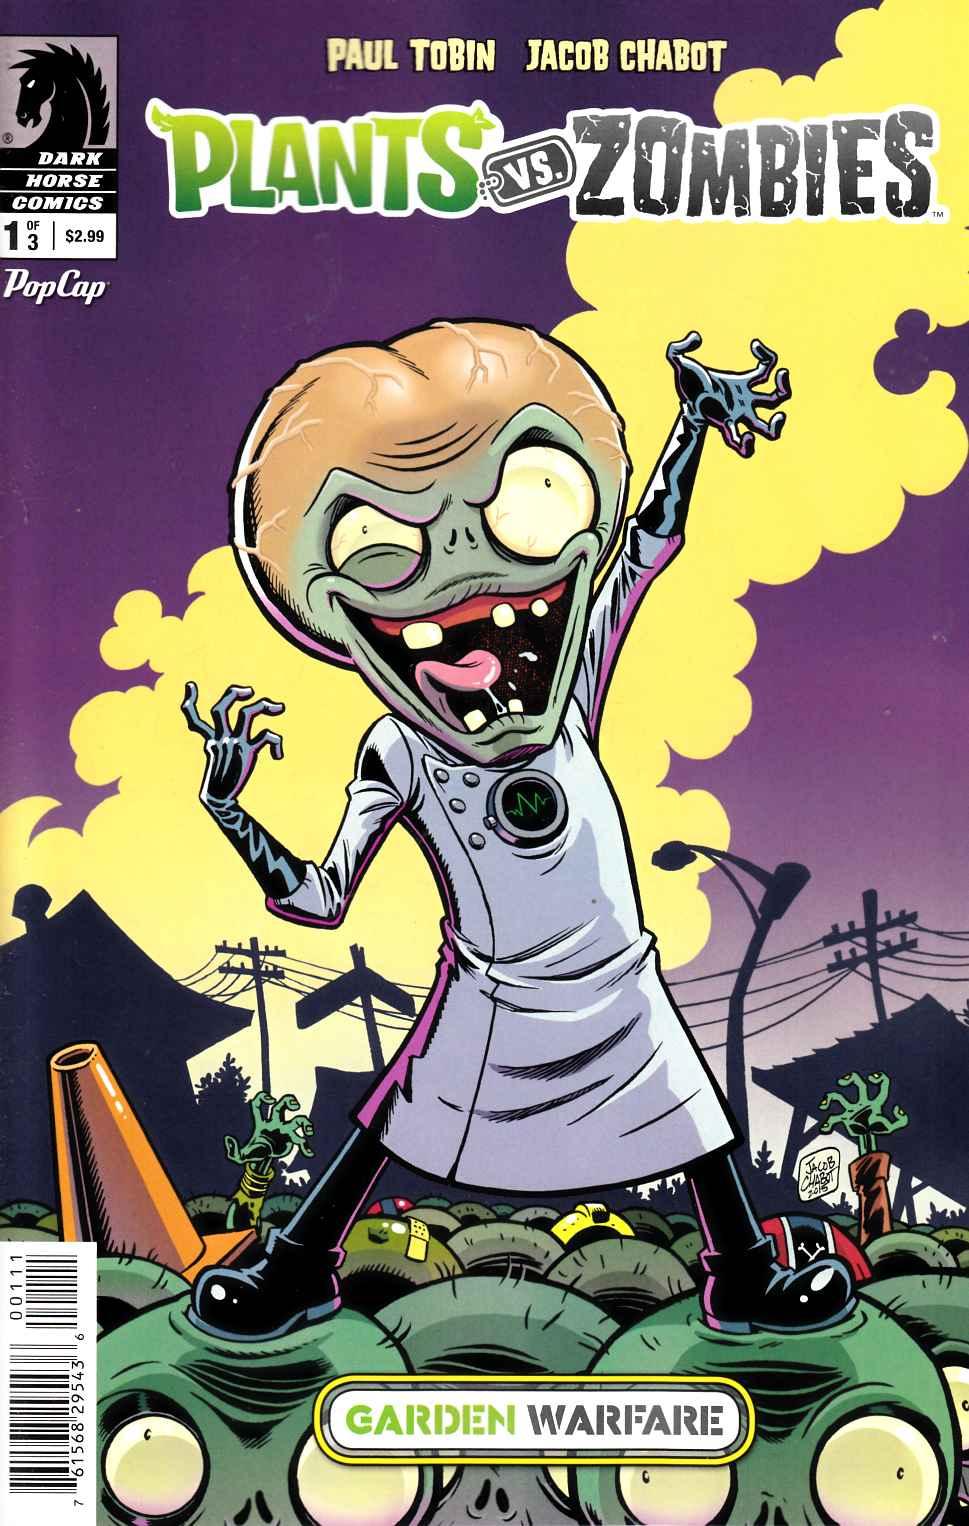 Plants Vs Zombies Garden Warfare #1 [Dark Horse Comic] View Enlarged Image